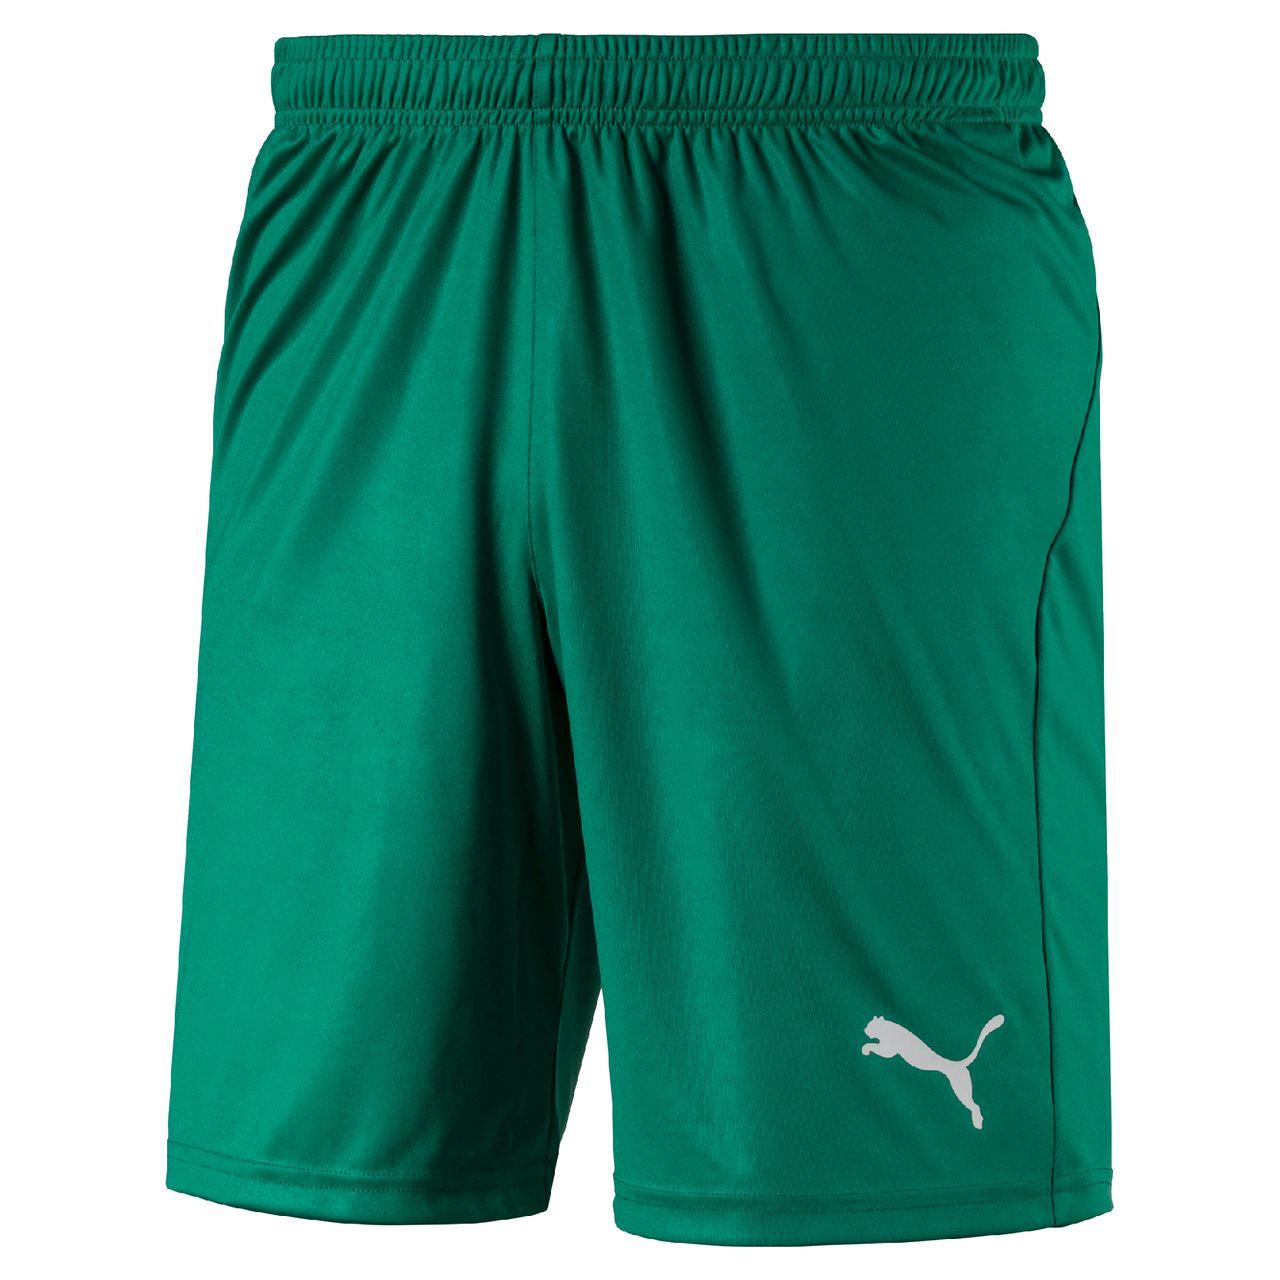 PUMA LIGA Shorts Core with Brief